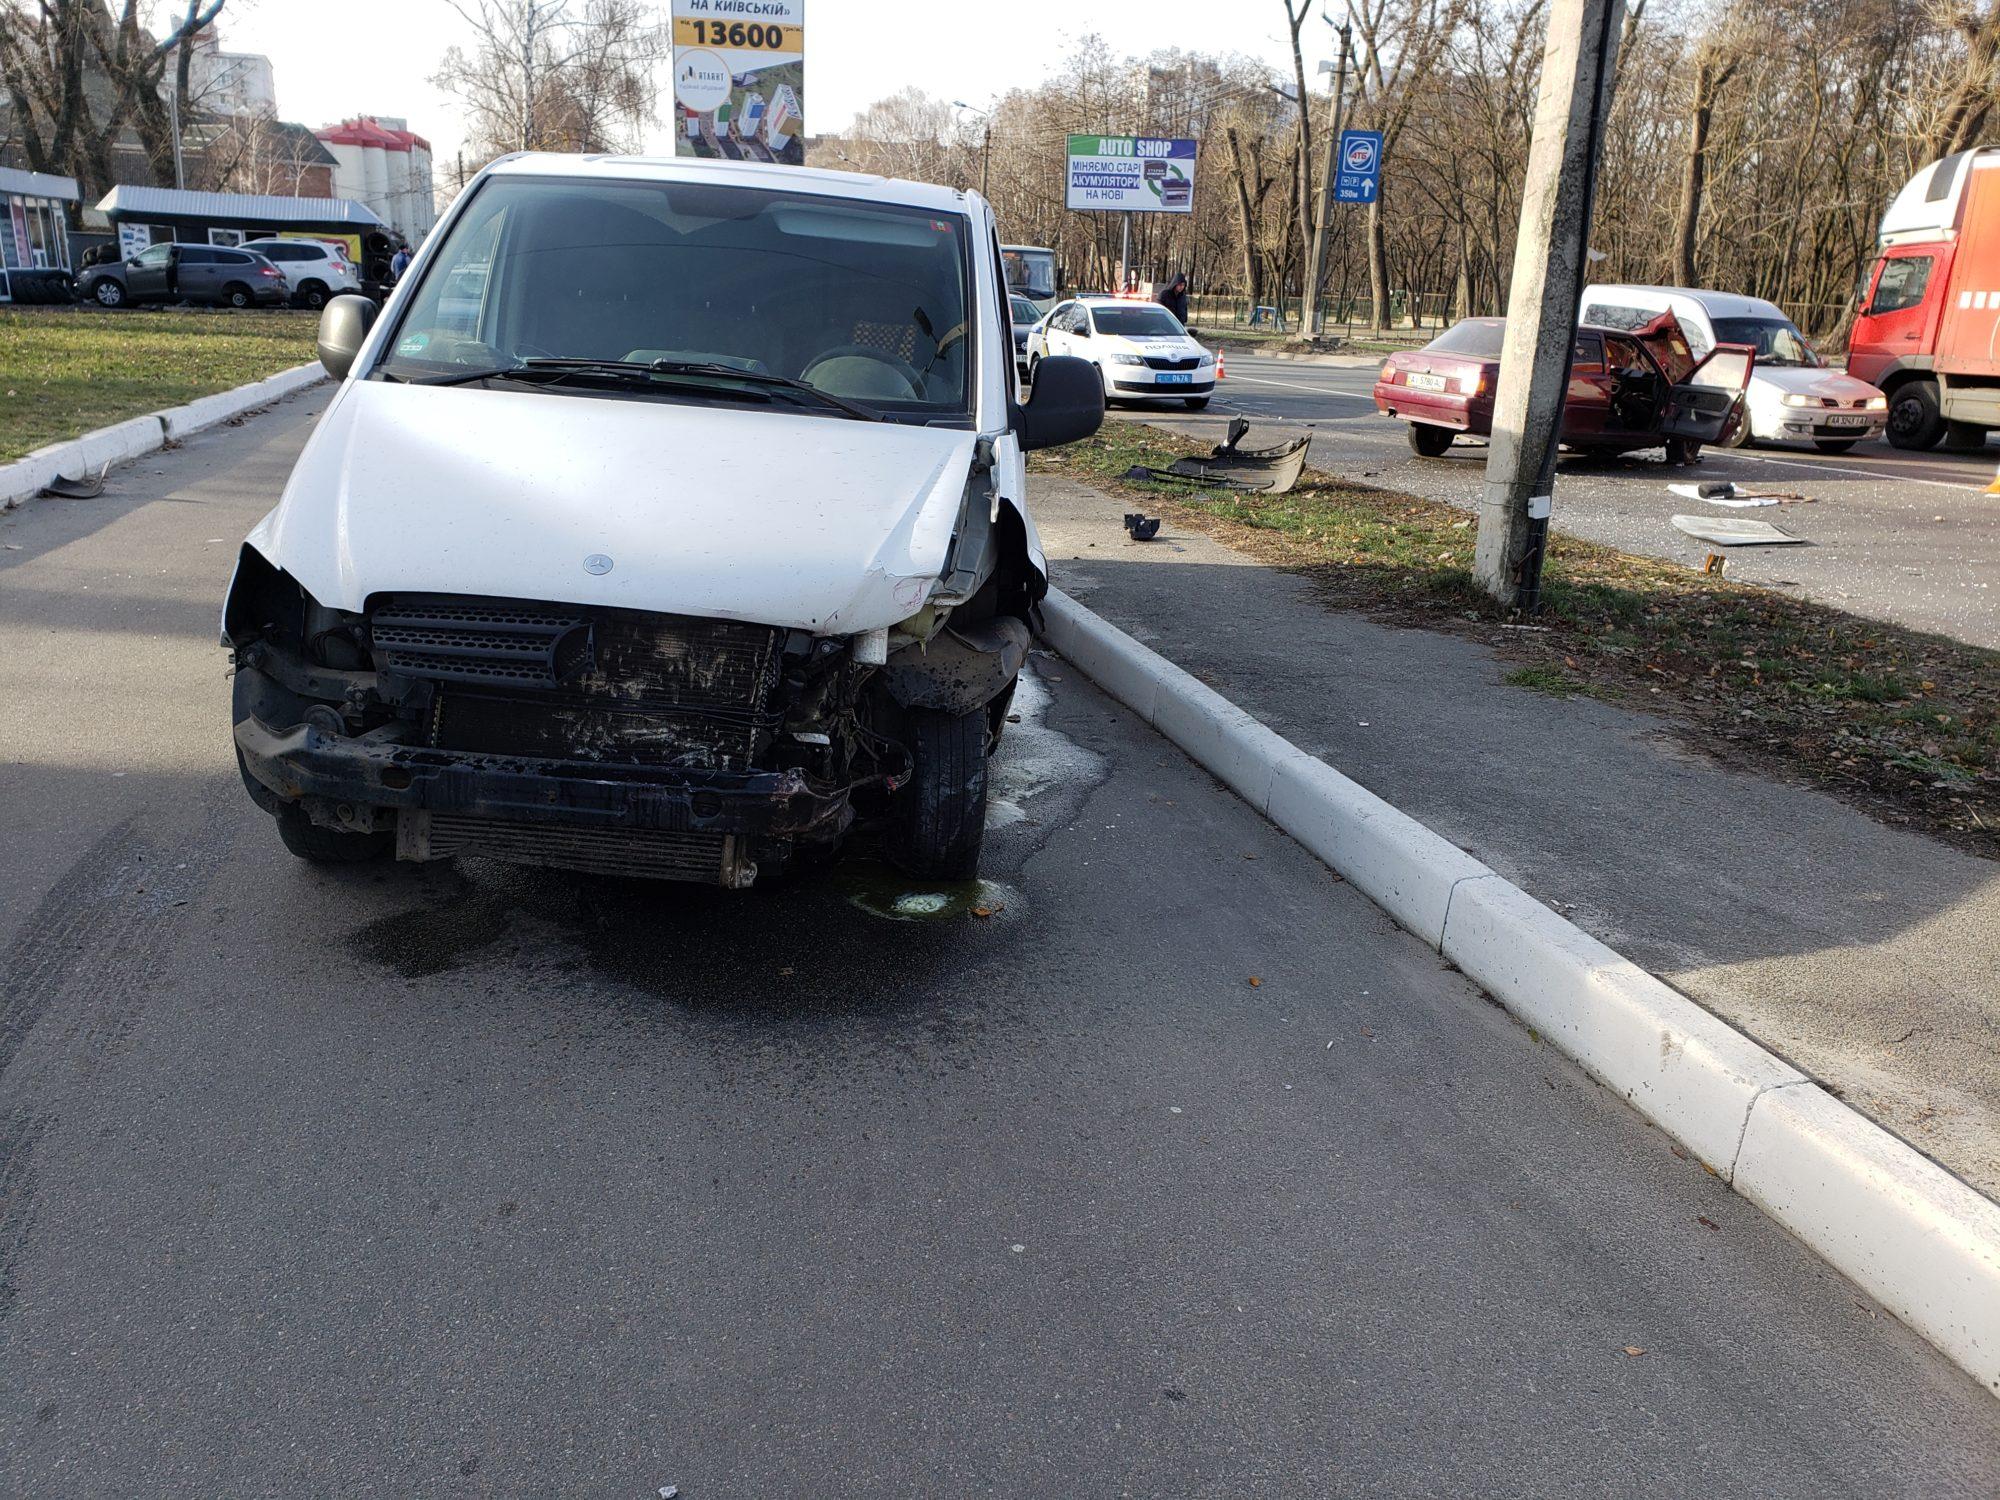 20191123_112913-2000x1500 Славута&Mercedes: у Броварах сталася ДТП